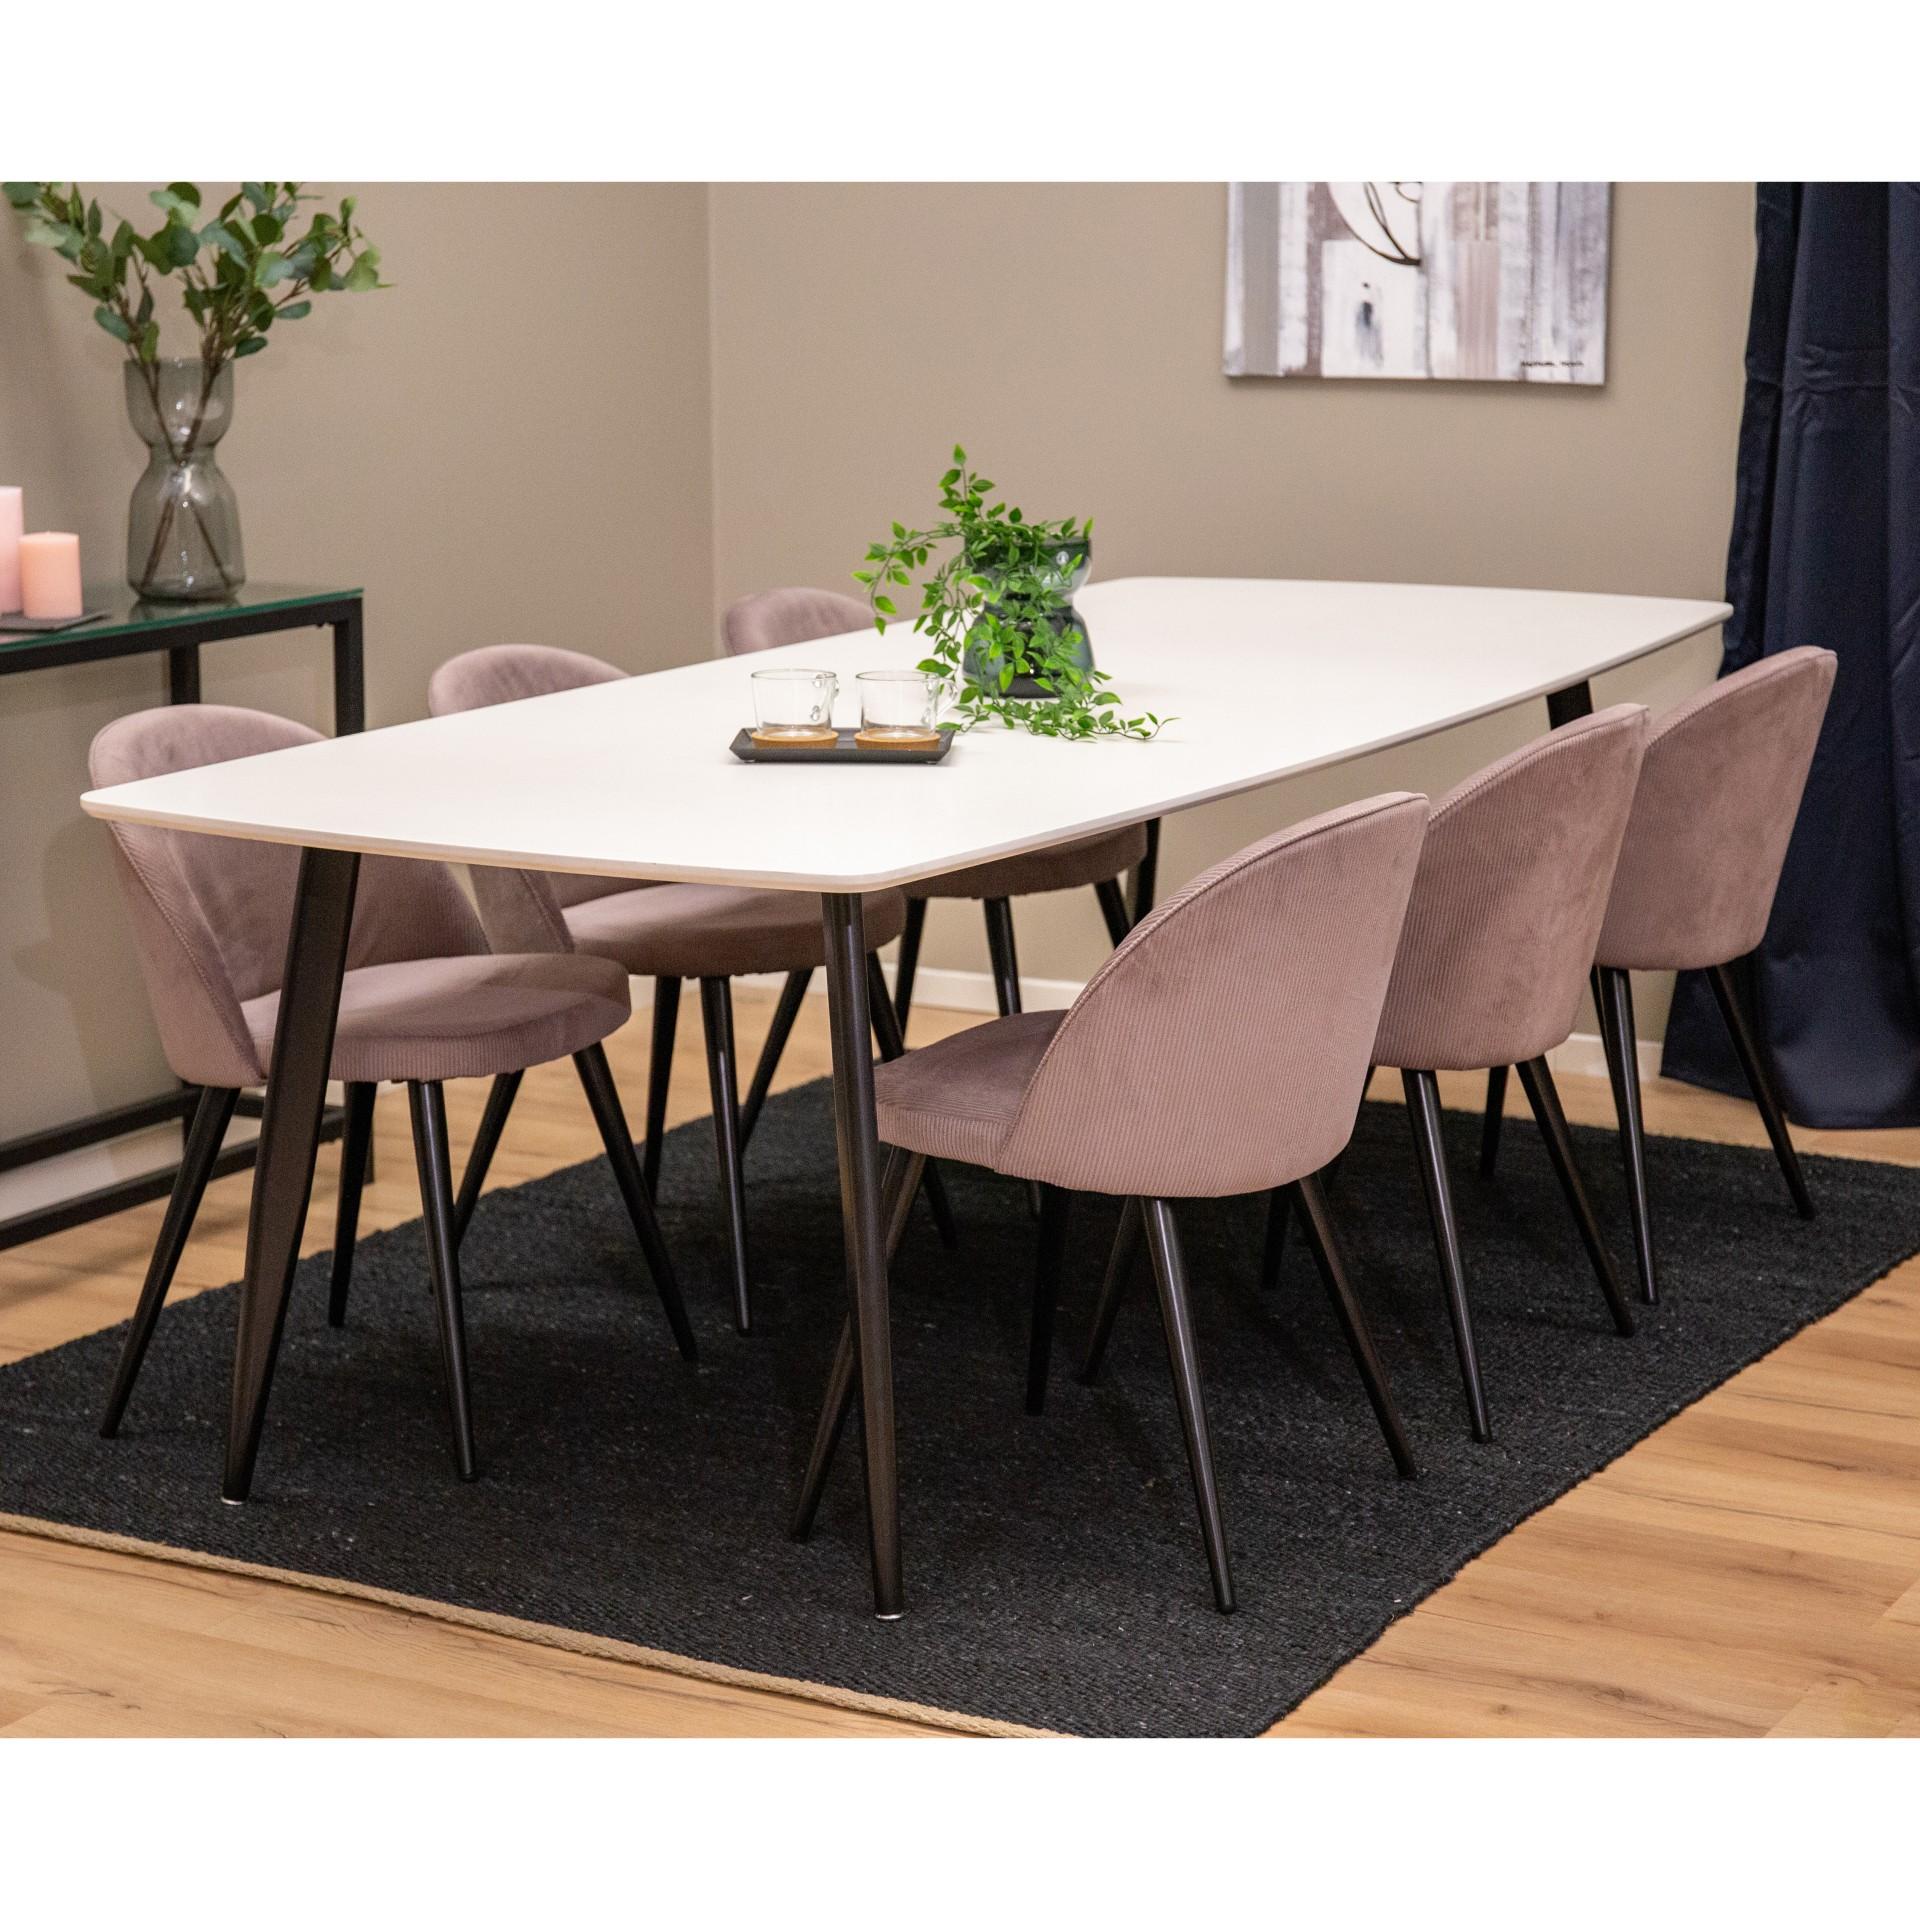 Mesa de jantar Polar, MDF/metal, branco/preto, 240x100